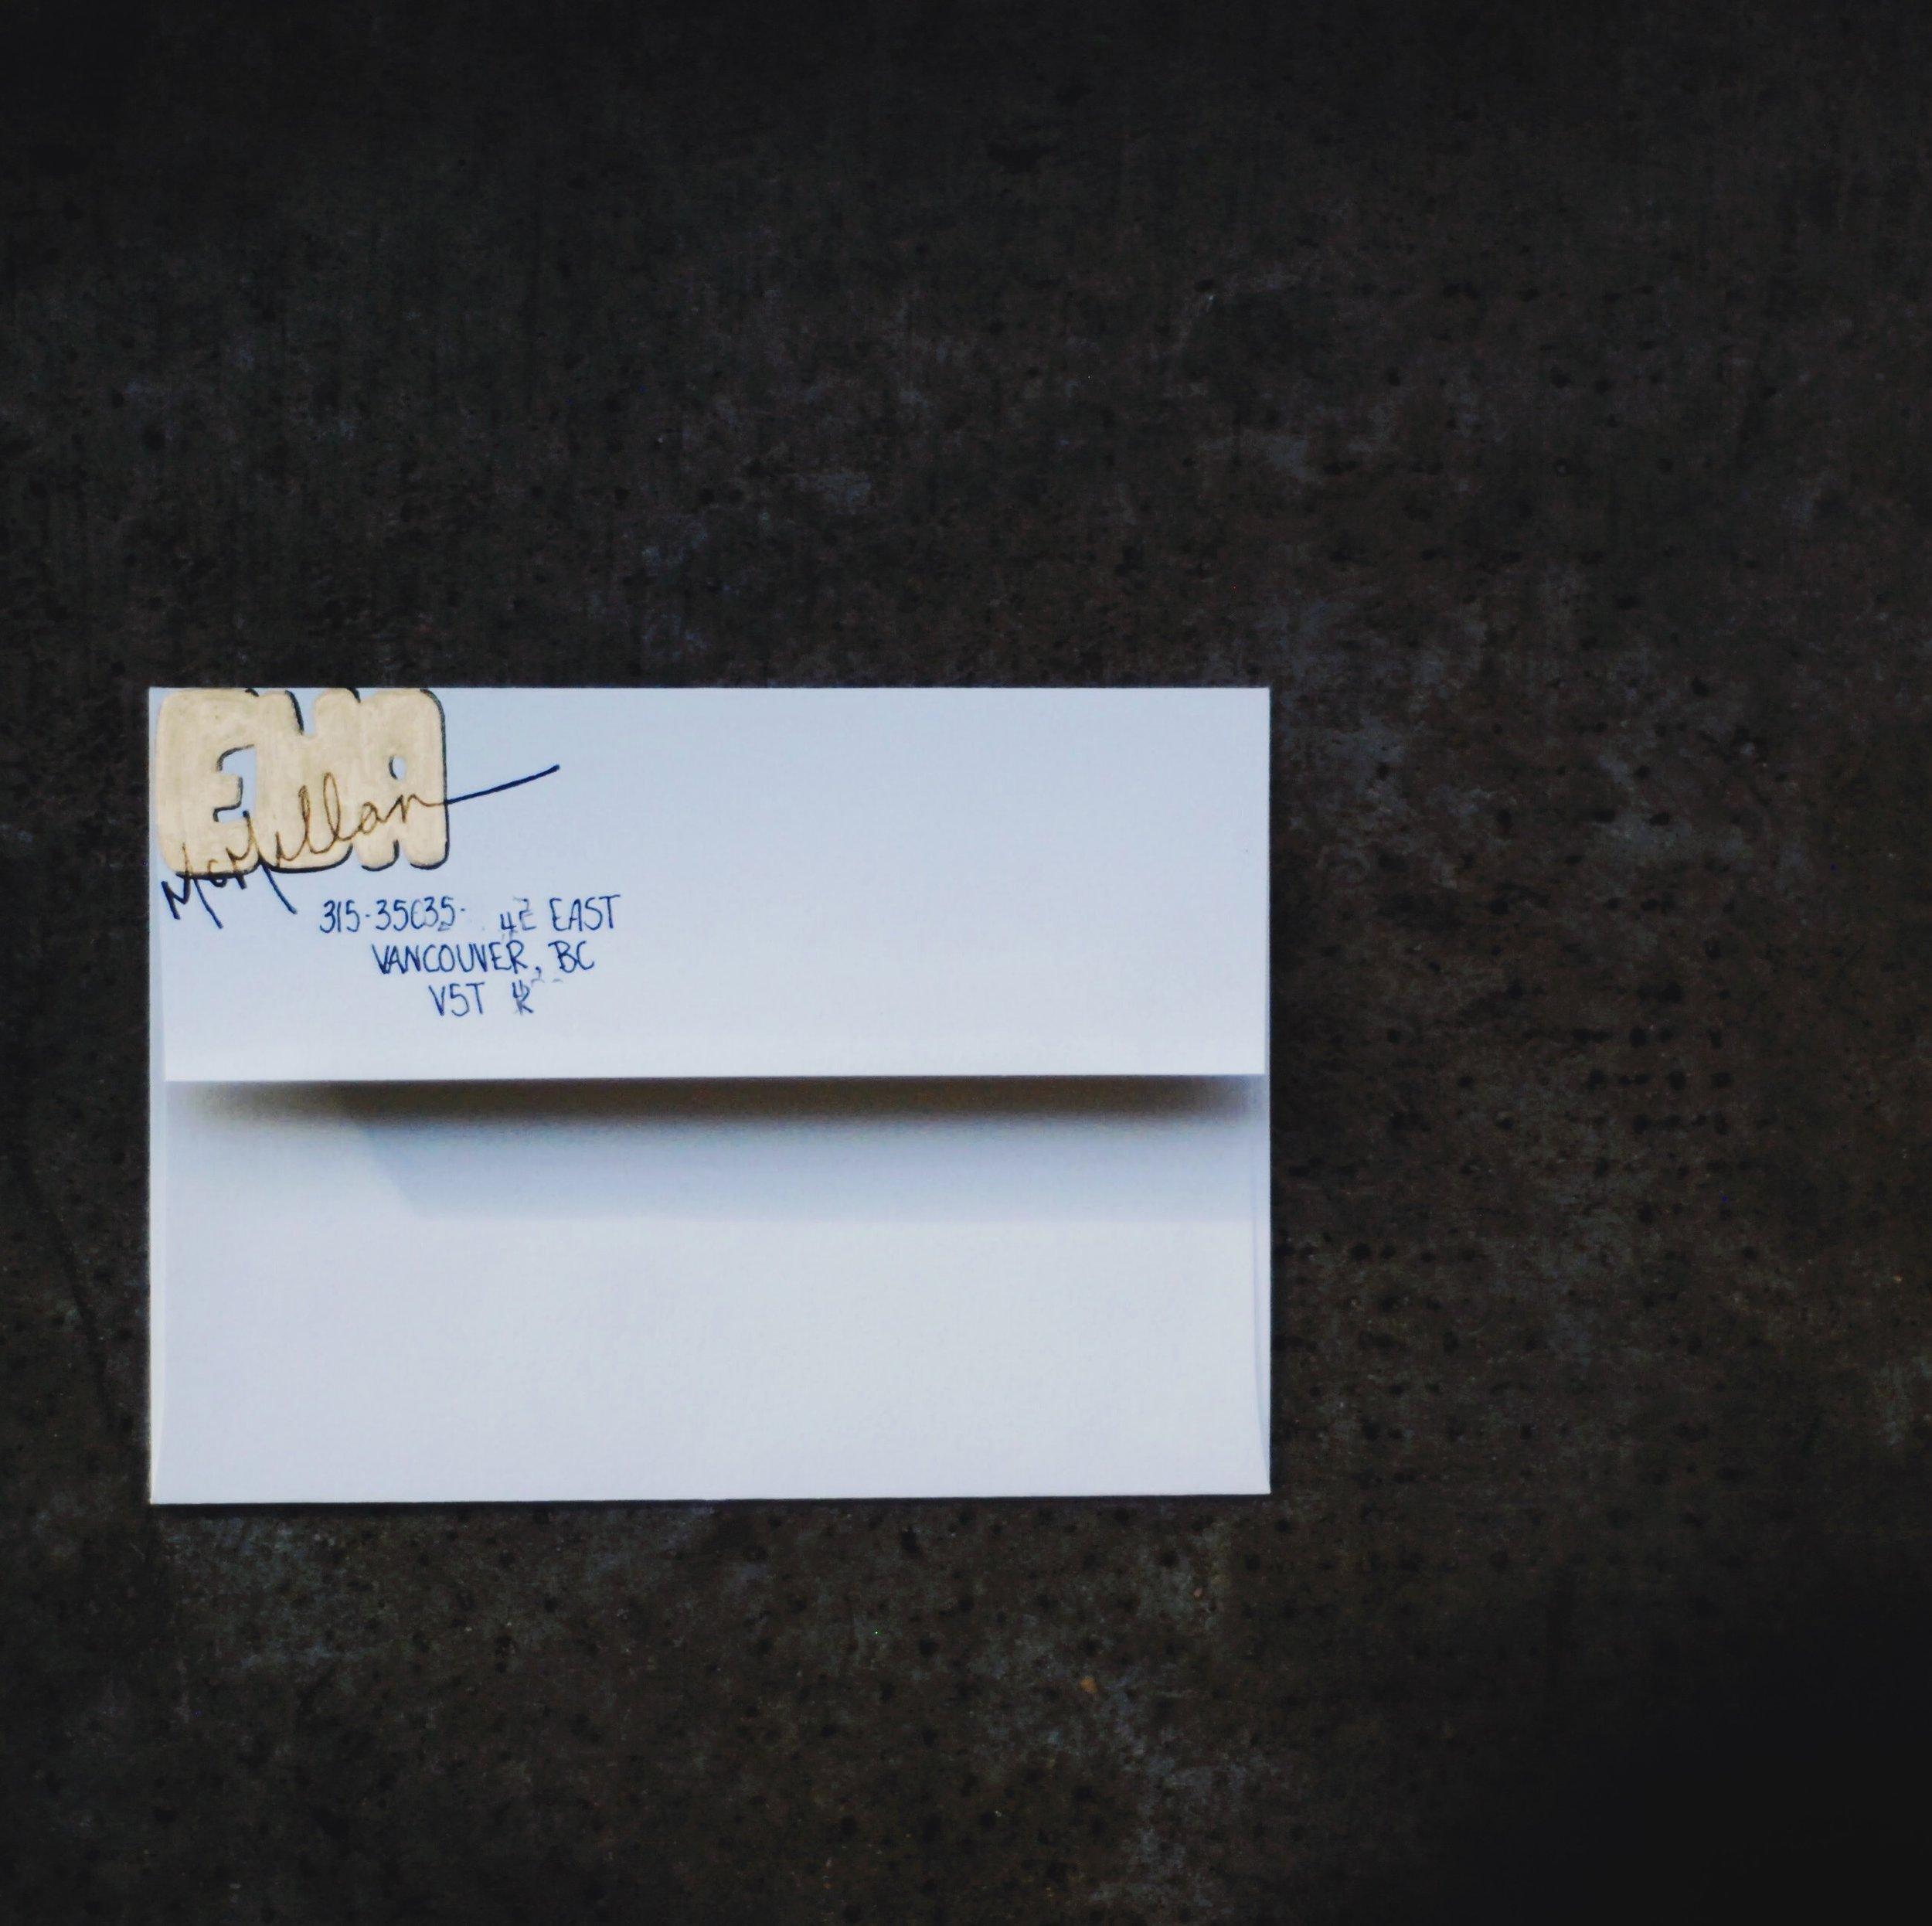 January 2017 Mail Club on livingforeva.com - painted gold hand lettered envelope